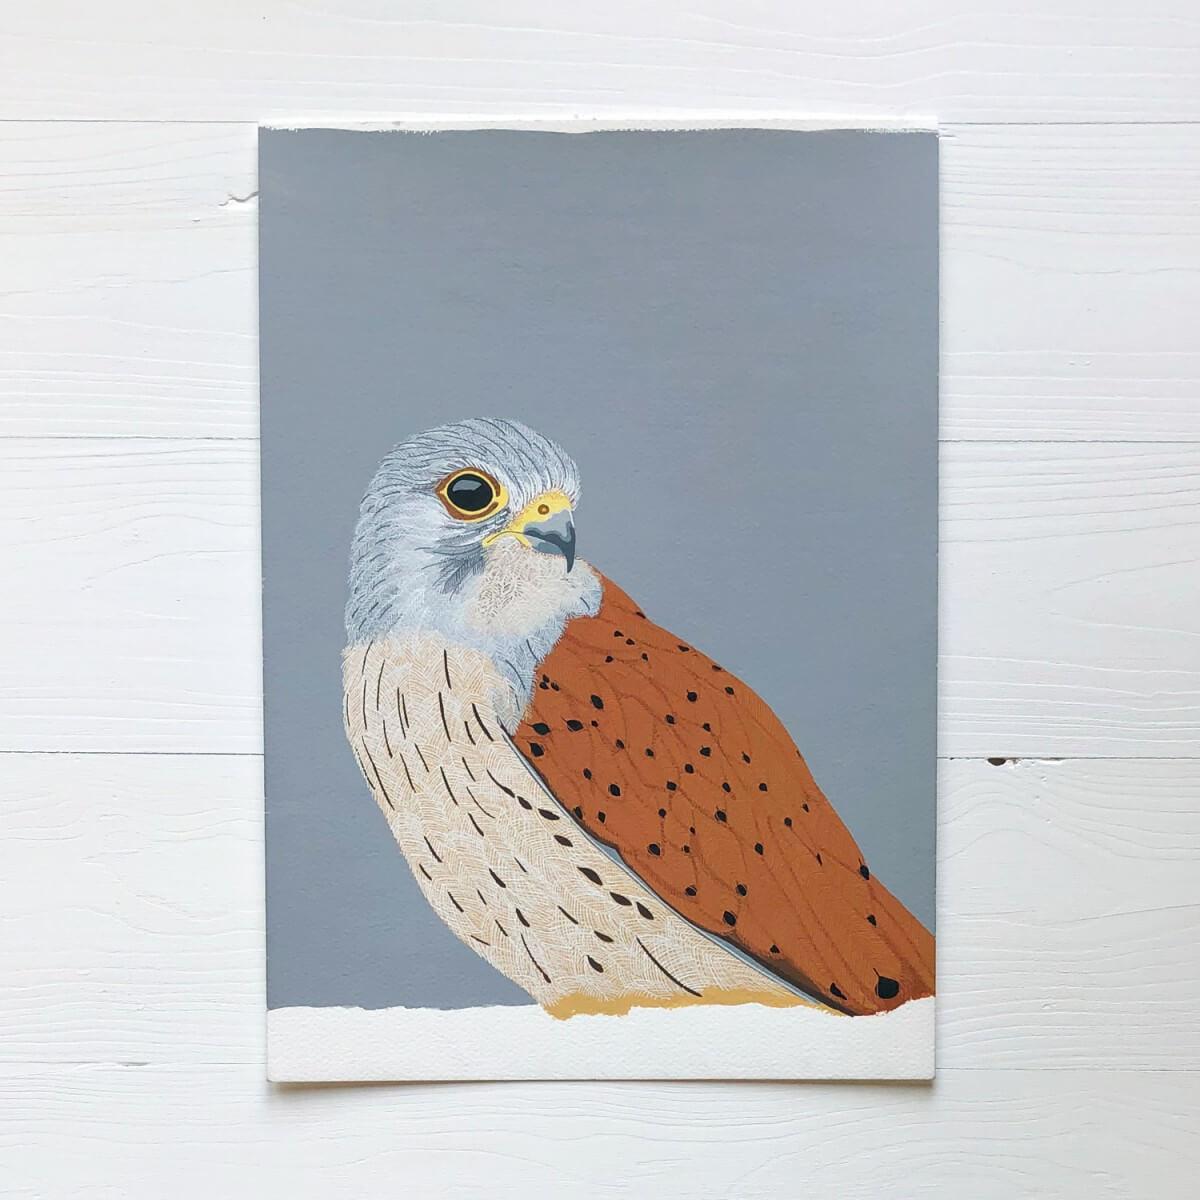 Kestrel Bird Of Prey Original Gouache Painting By Bird